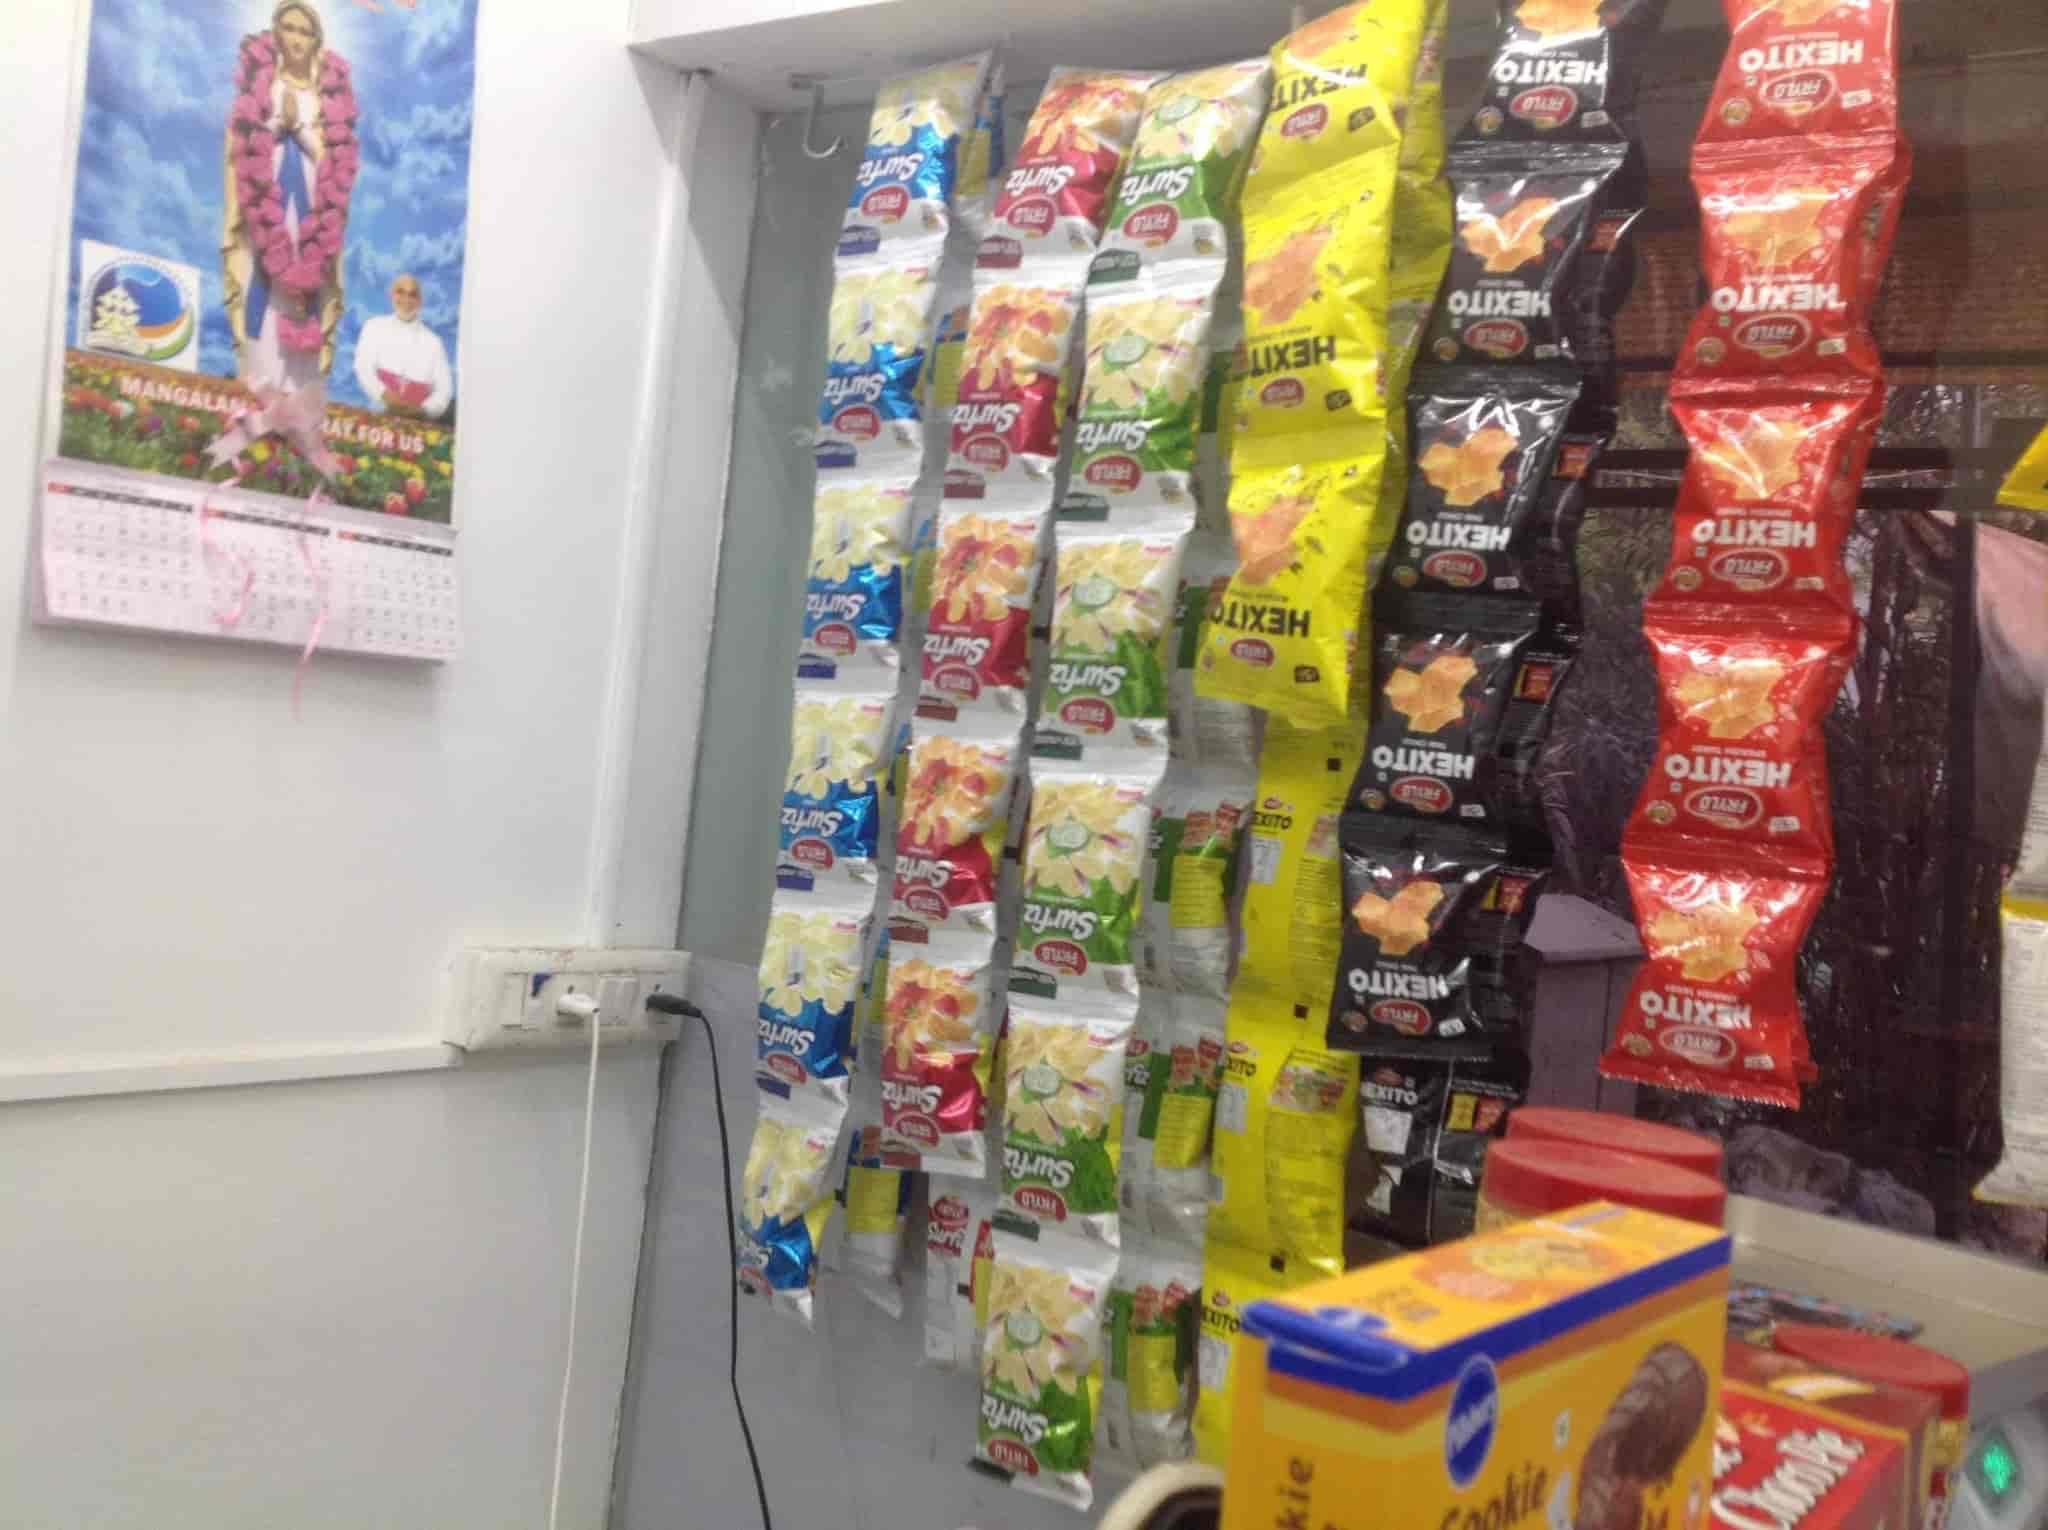 Grace Store, Gota Road - Cake Shops in Ahmedabad - Justdial